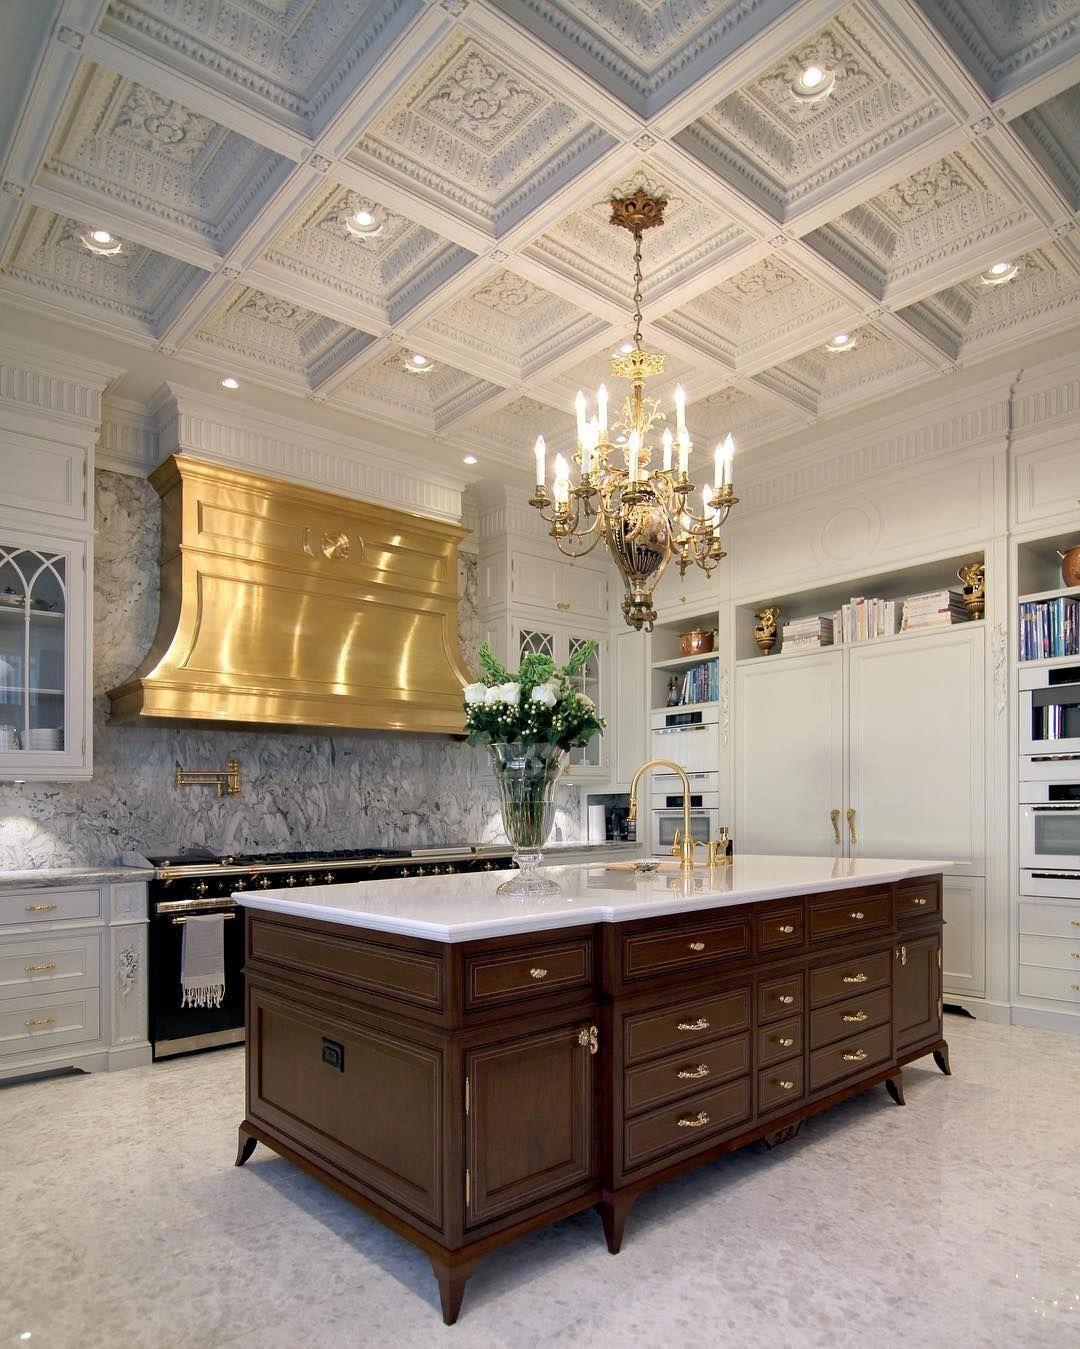 15 Best Kitchen Remodel Ideas: 151 отметок «Нравится», 15 комментариев